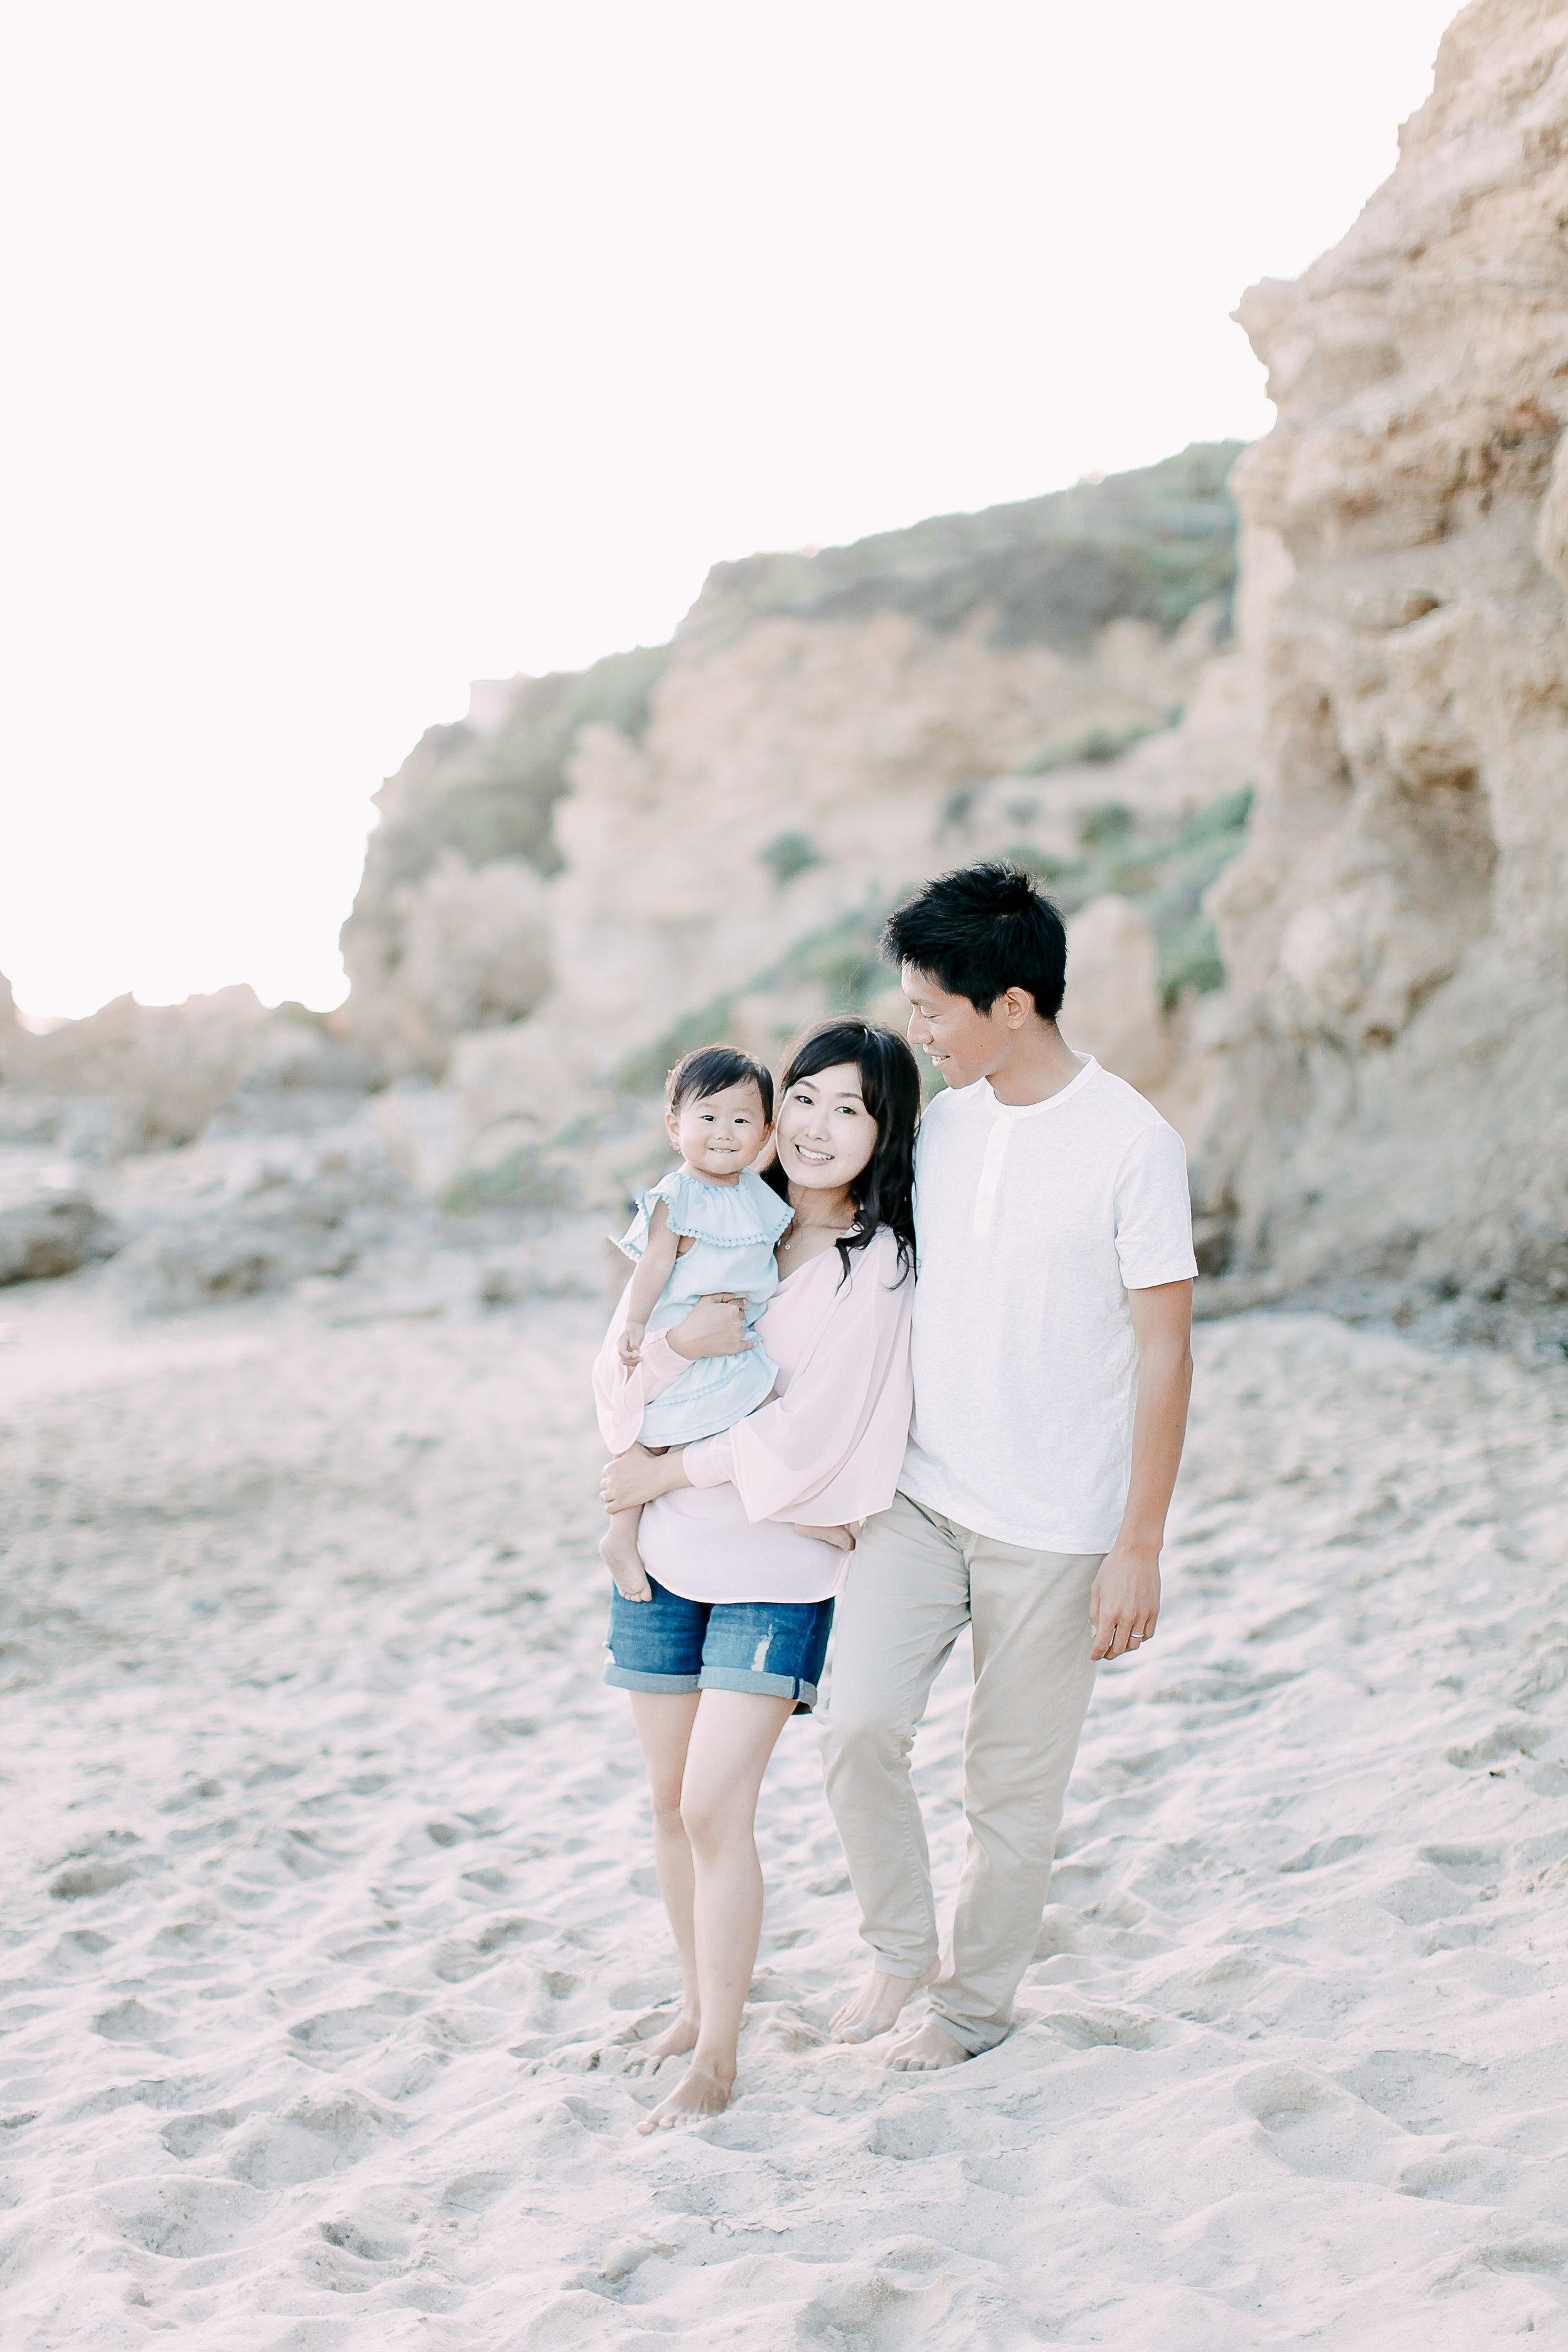 Cori Kleckner Photography- Ryoko Family Session1-29.JPG